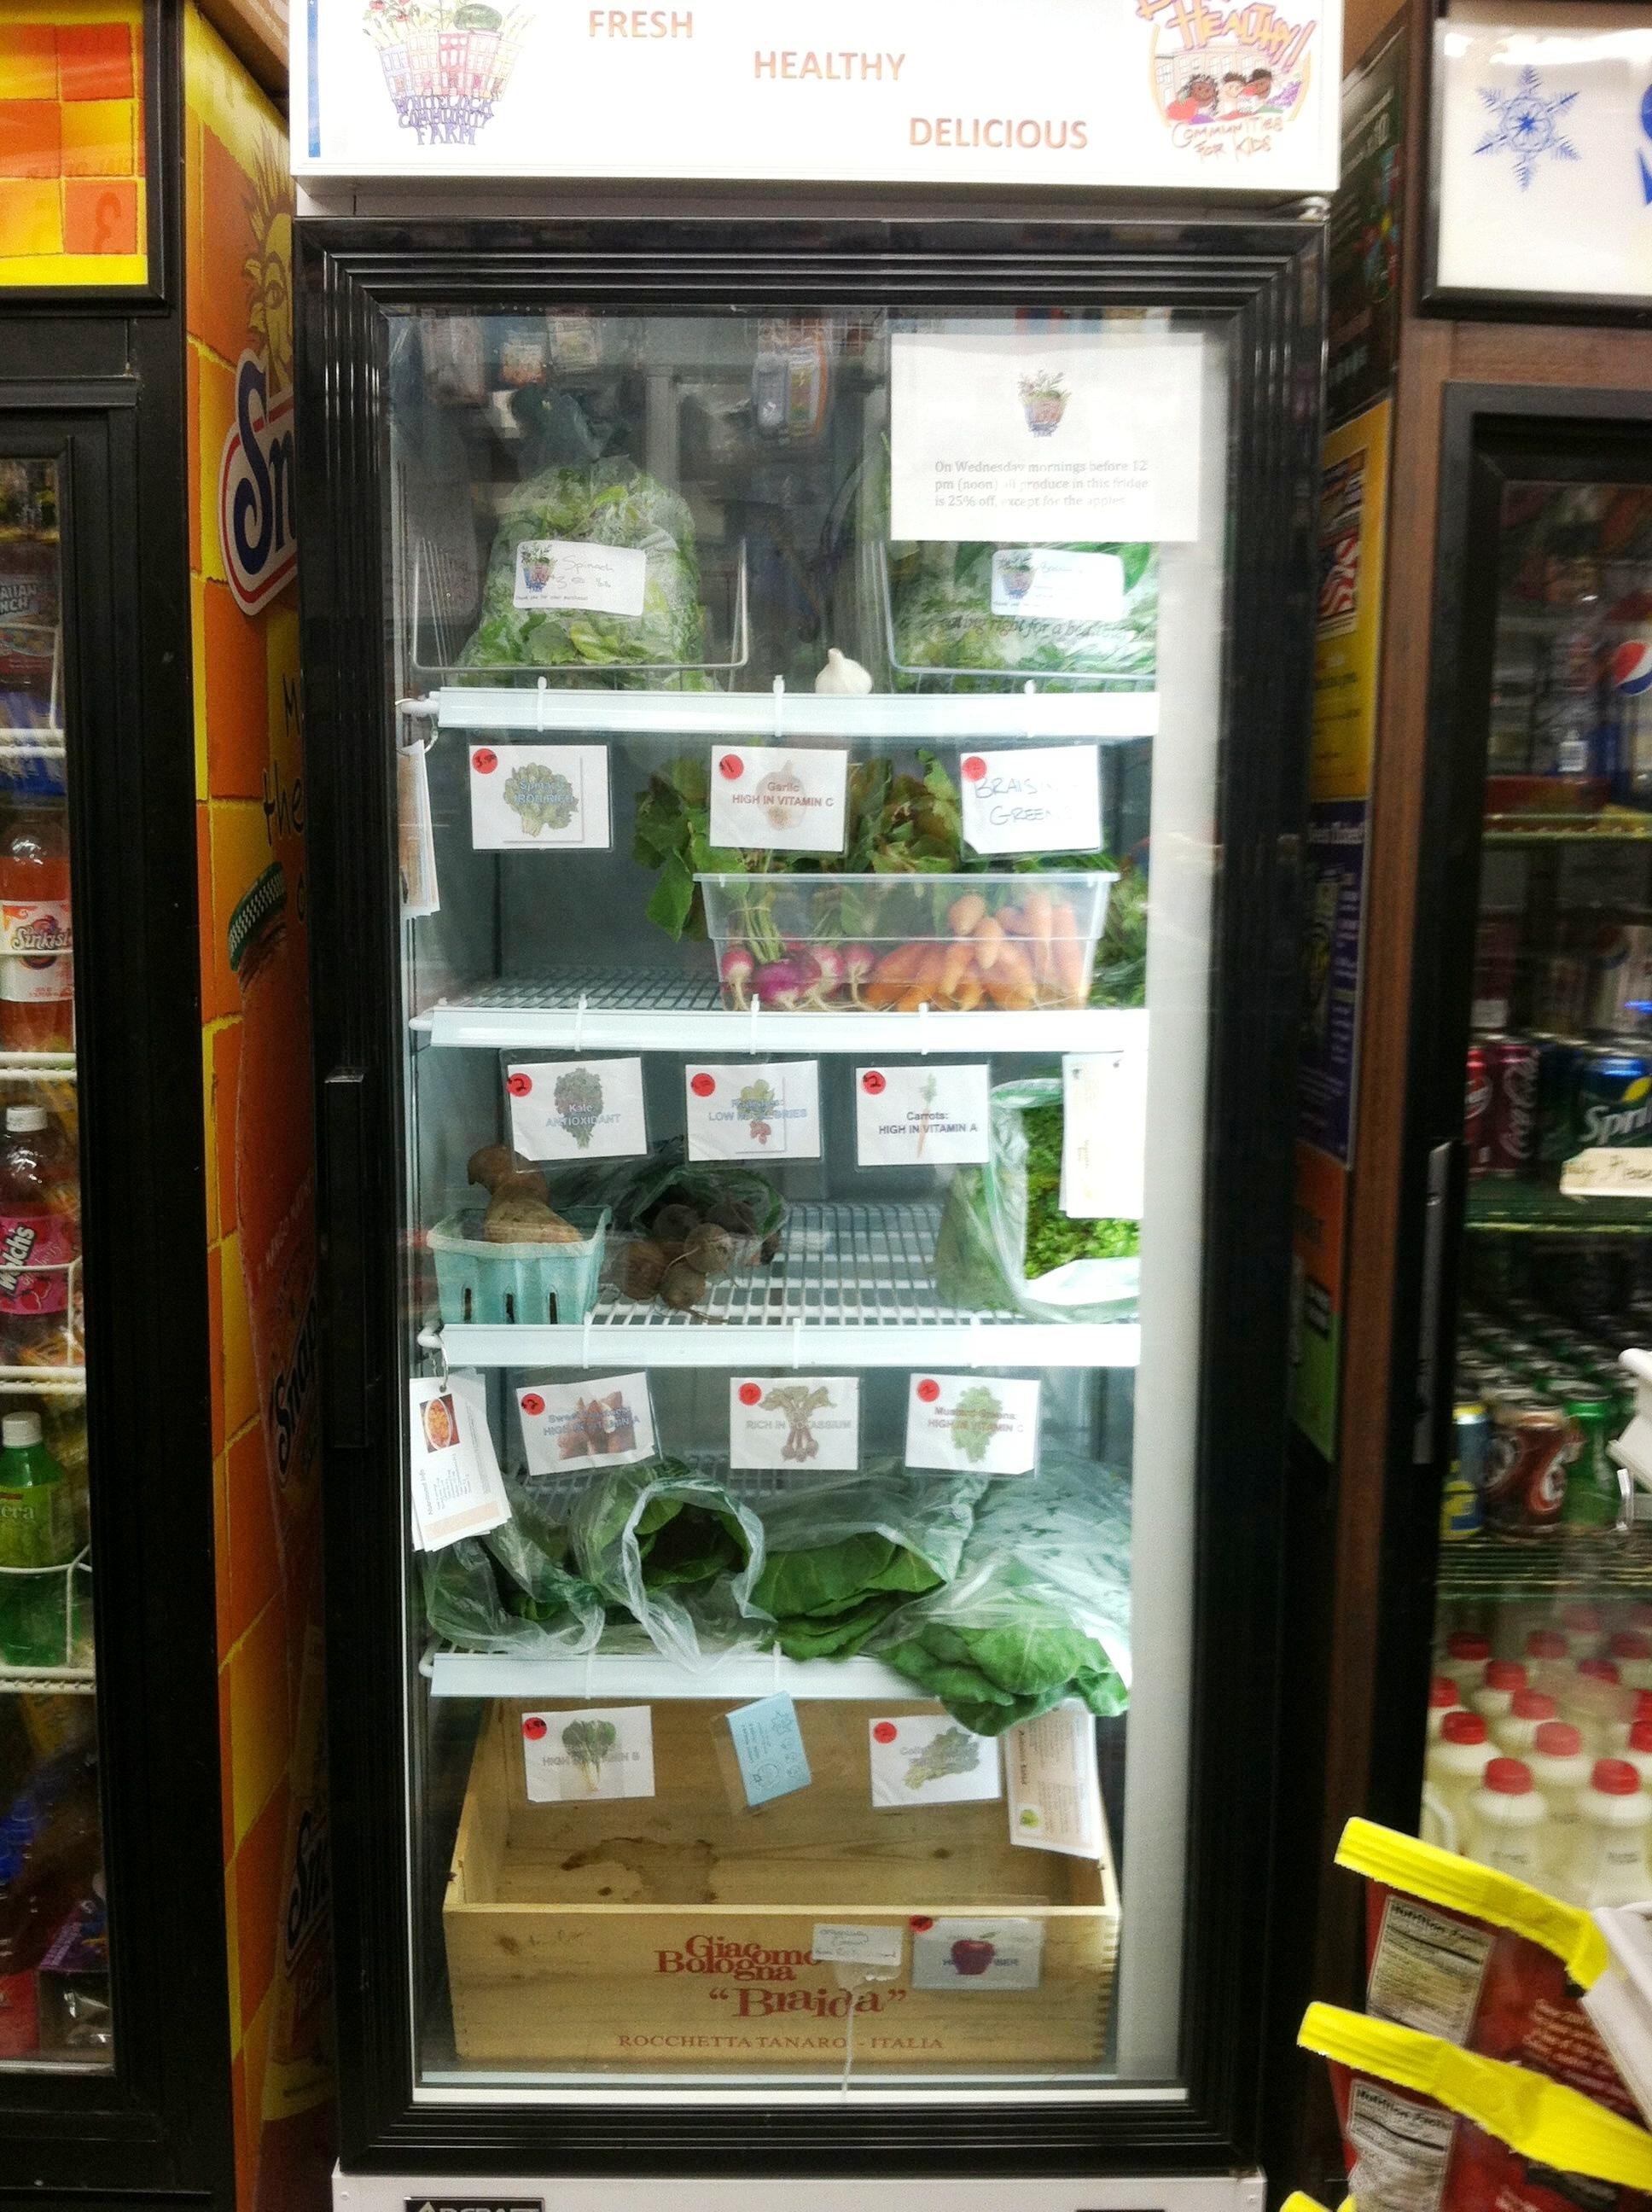 Whitelock Community Farm fridge